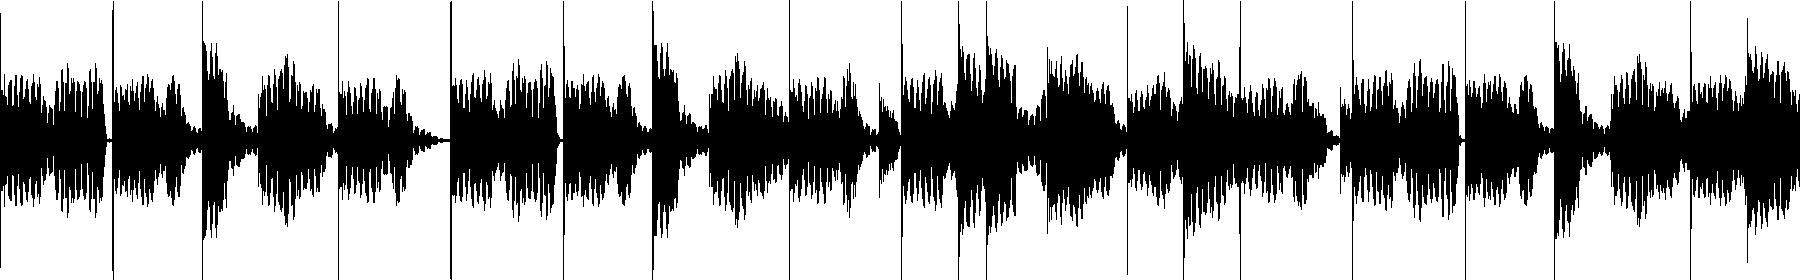 bassypluk bassloop synth 129